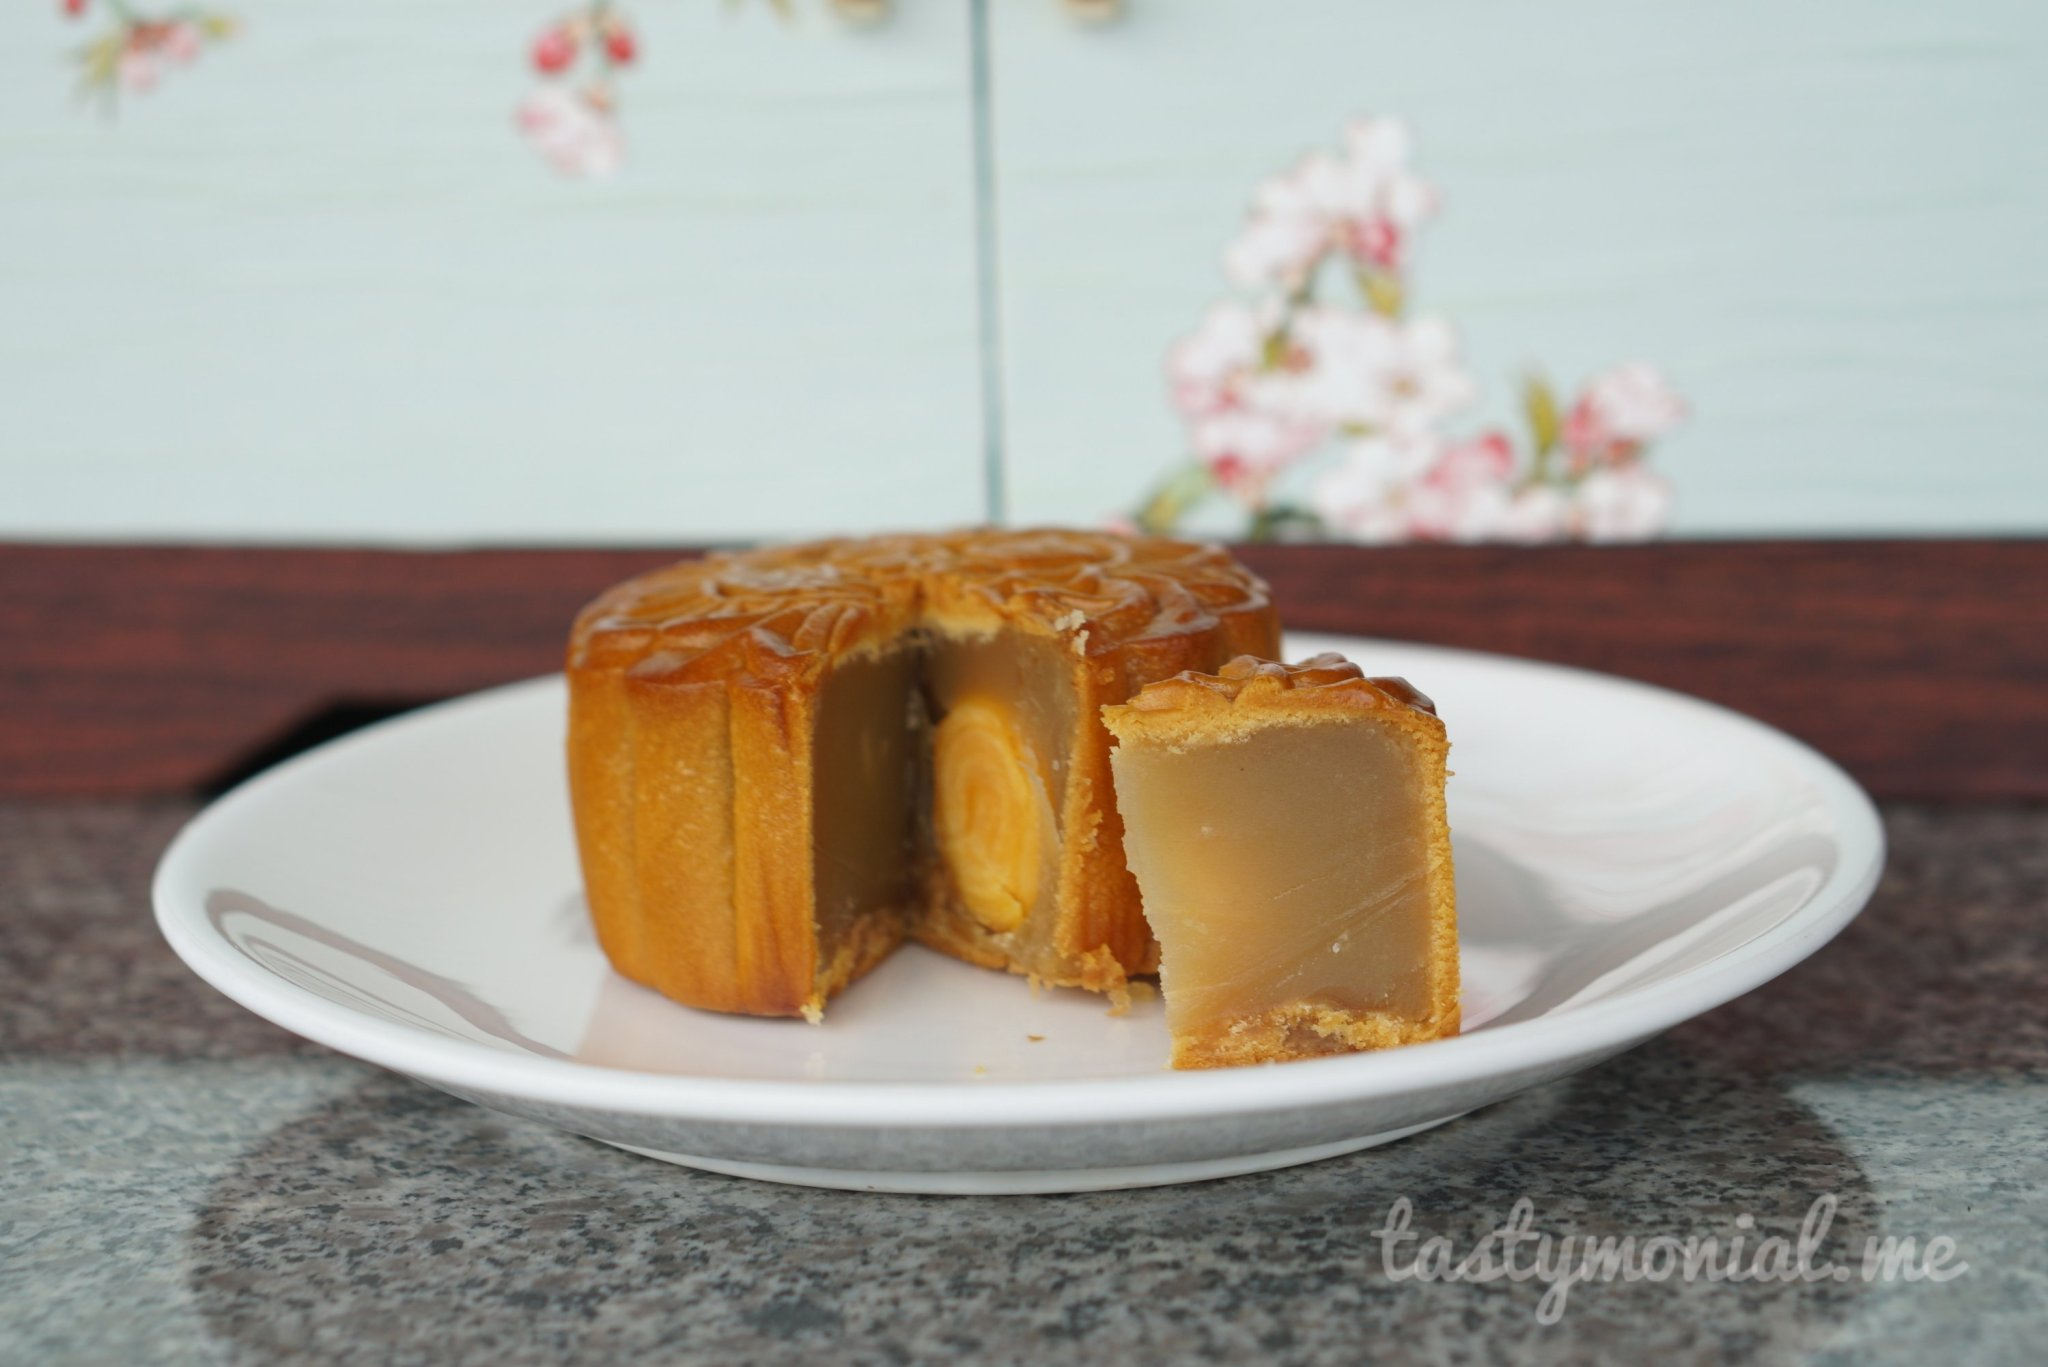 Low Sugar Silver Lotus Paste with double yolk mooncake